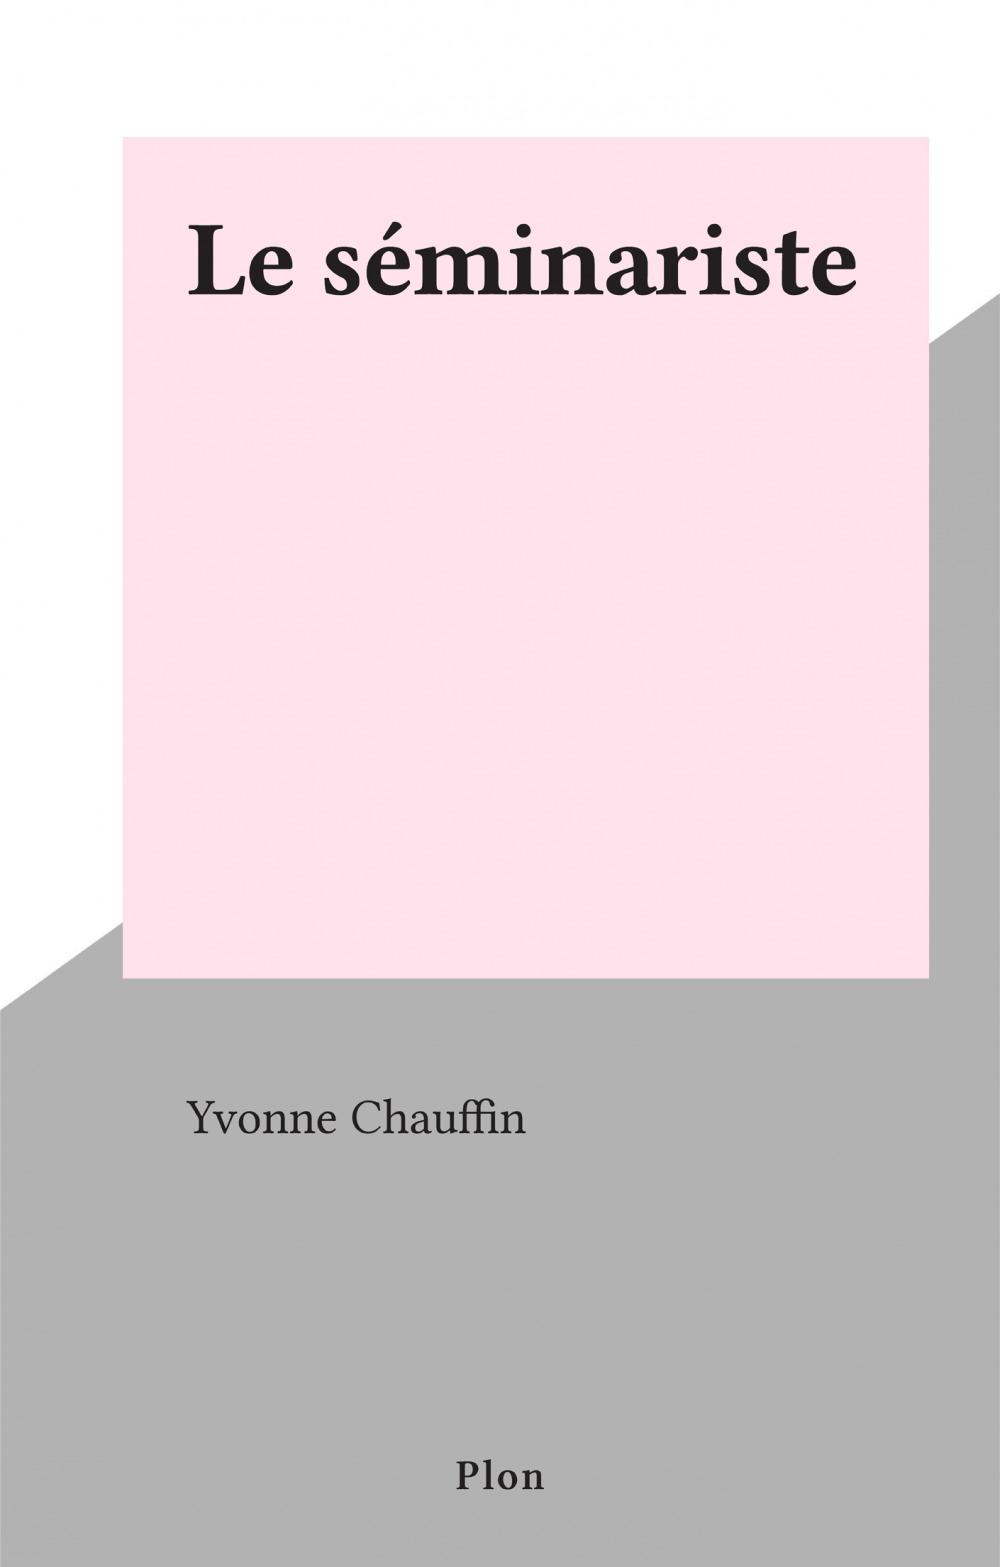 Le séminariste  - Yvonne Chauffin